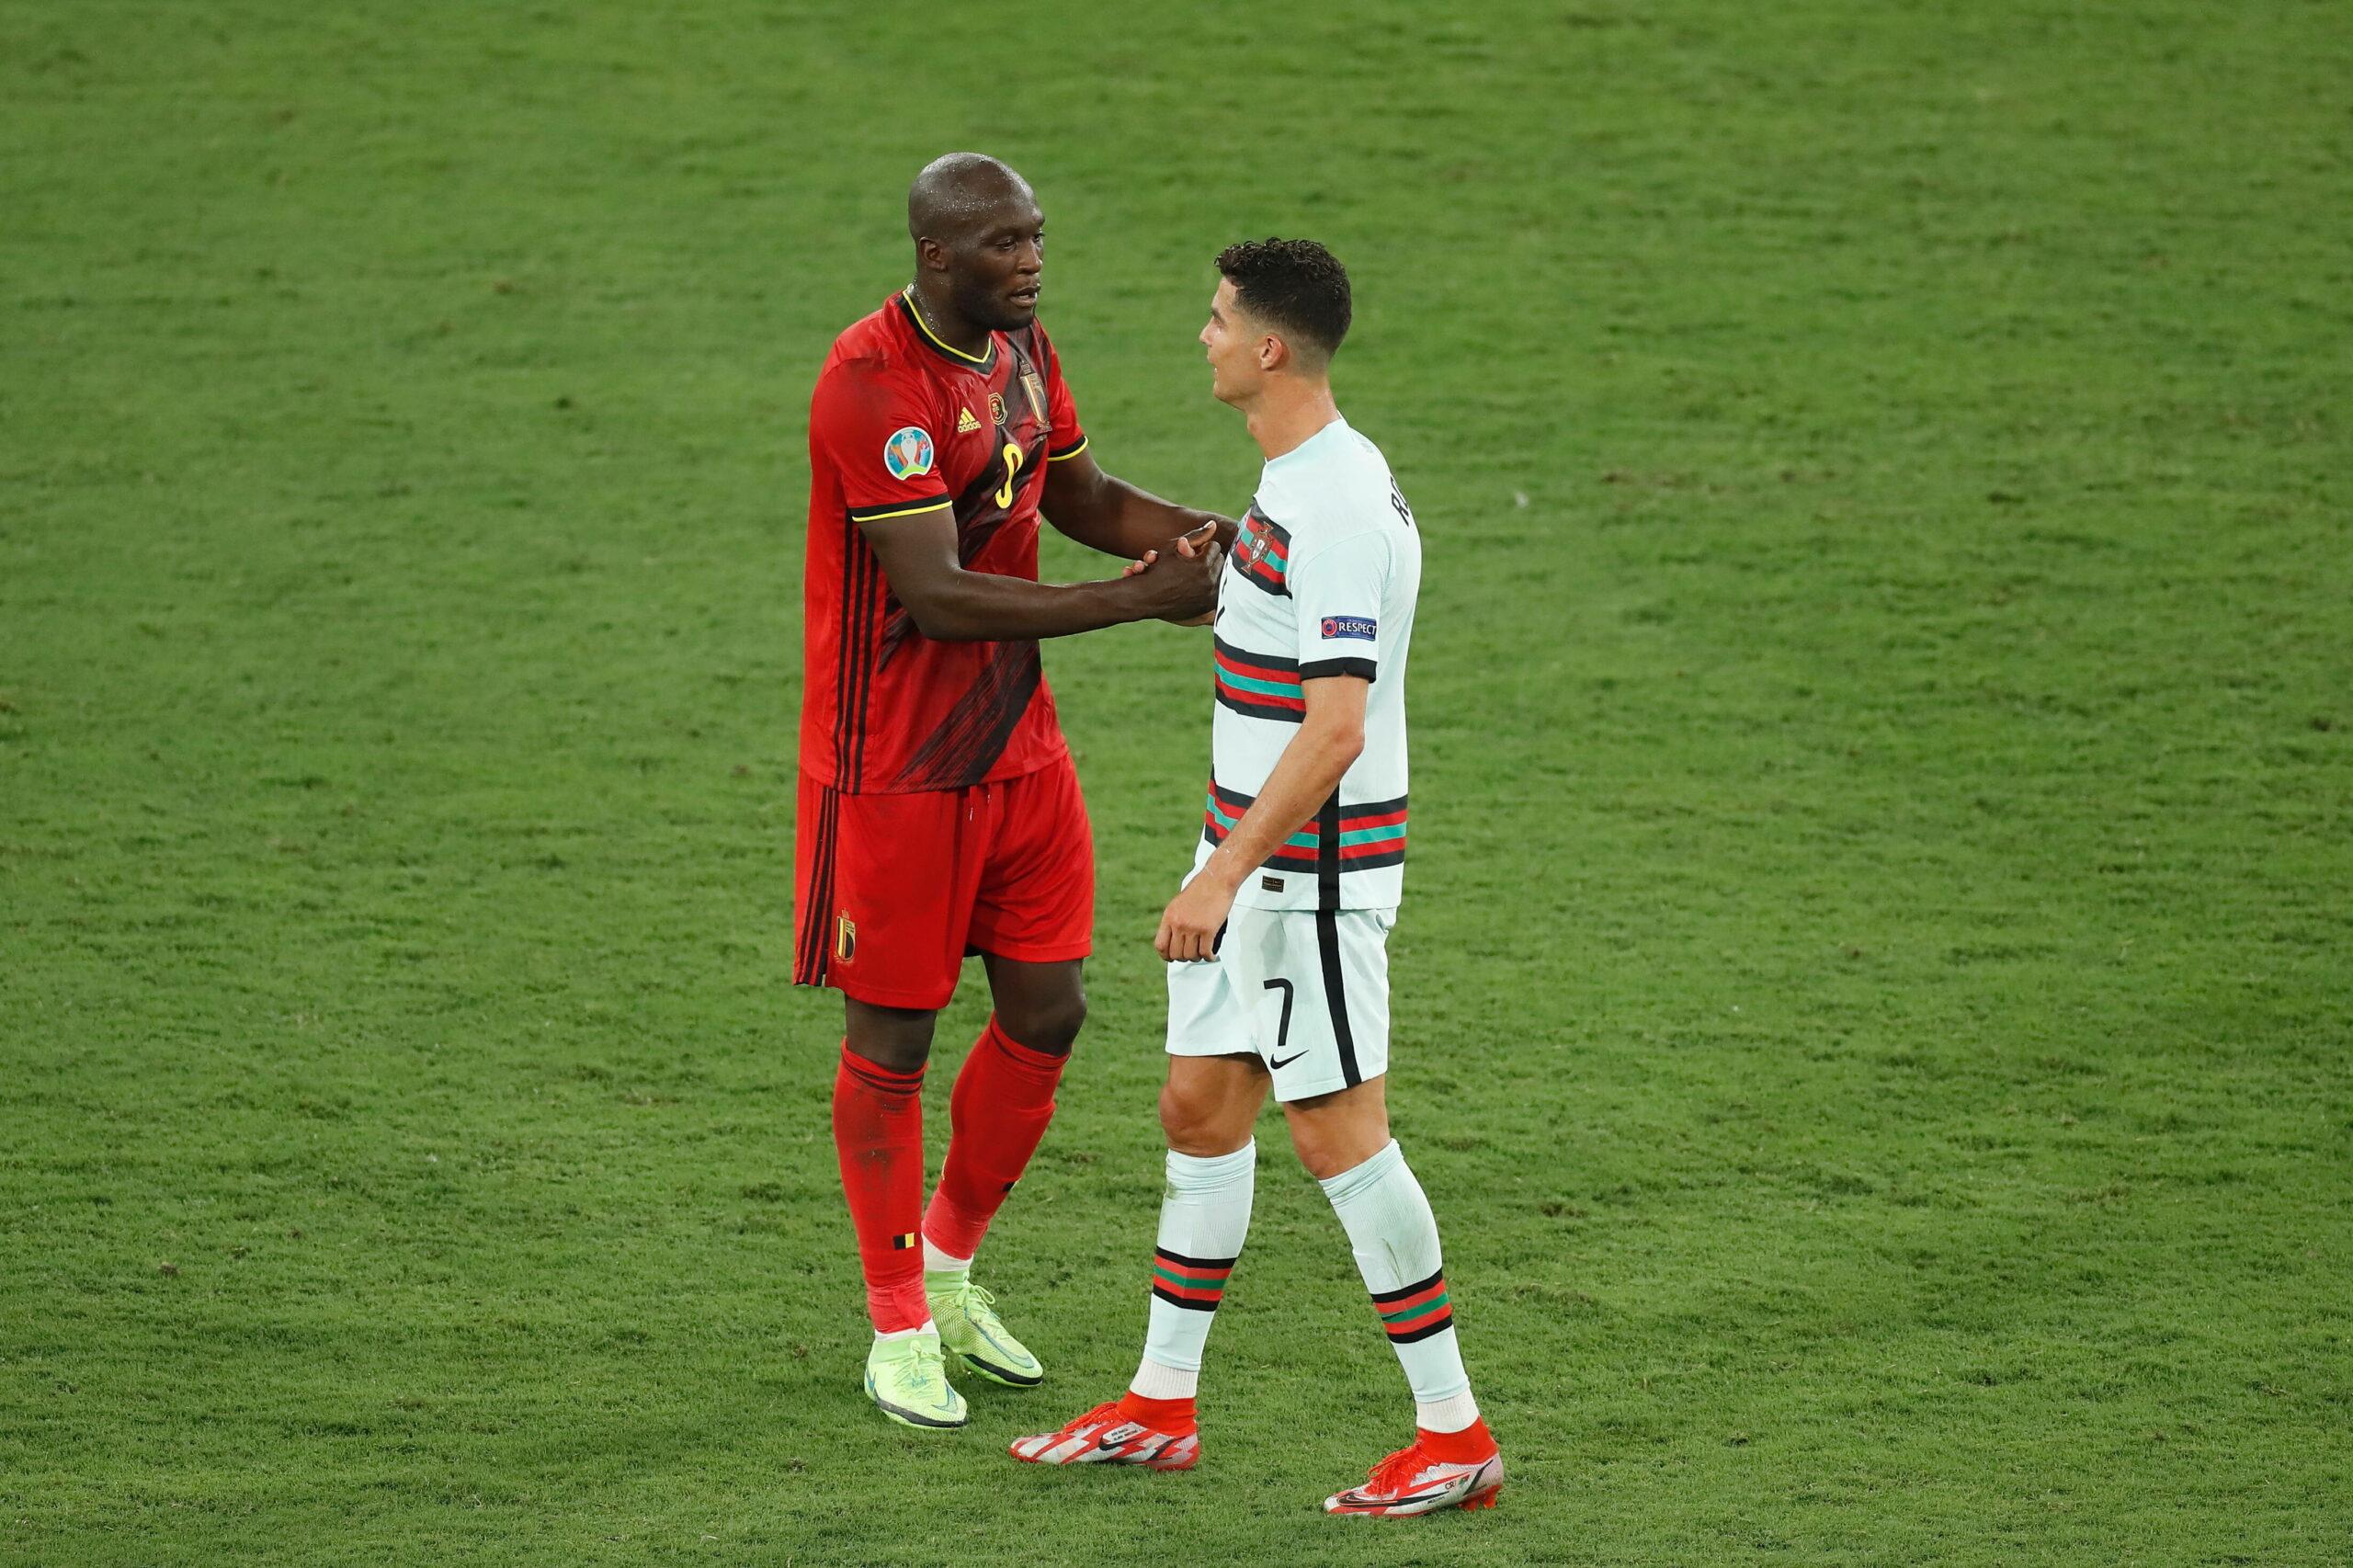 Darren Bent chooses between Romelu Lukaku and Cristiano Ronaldo